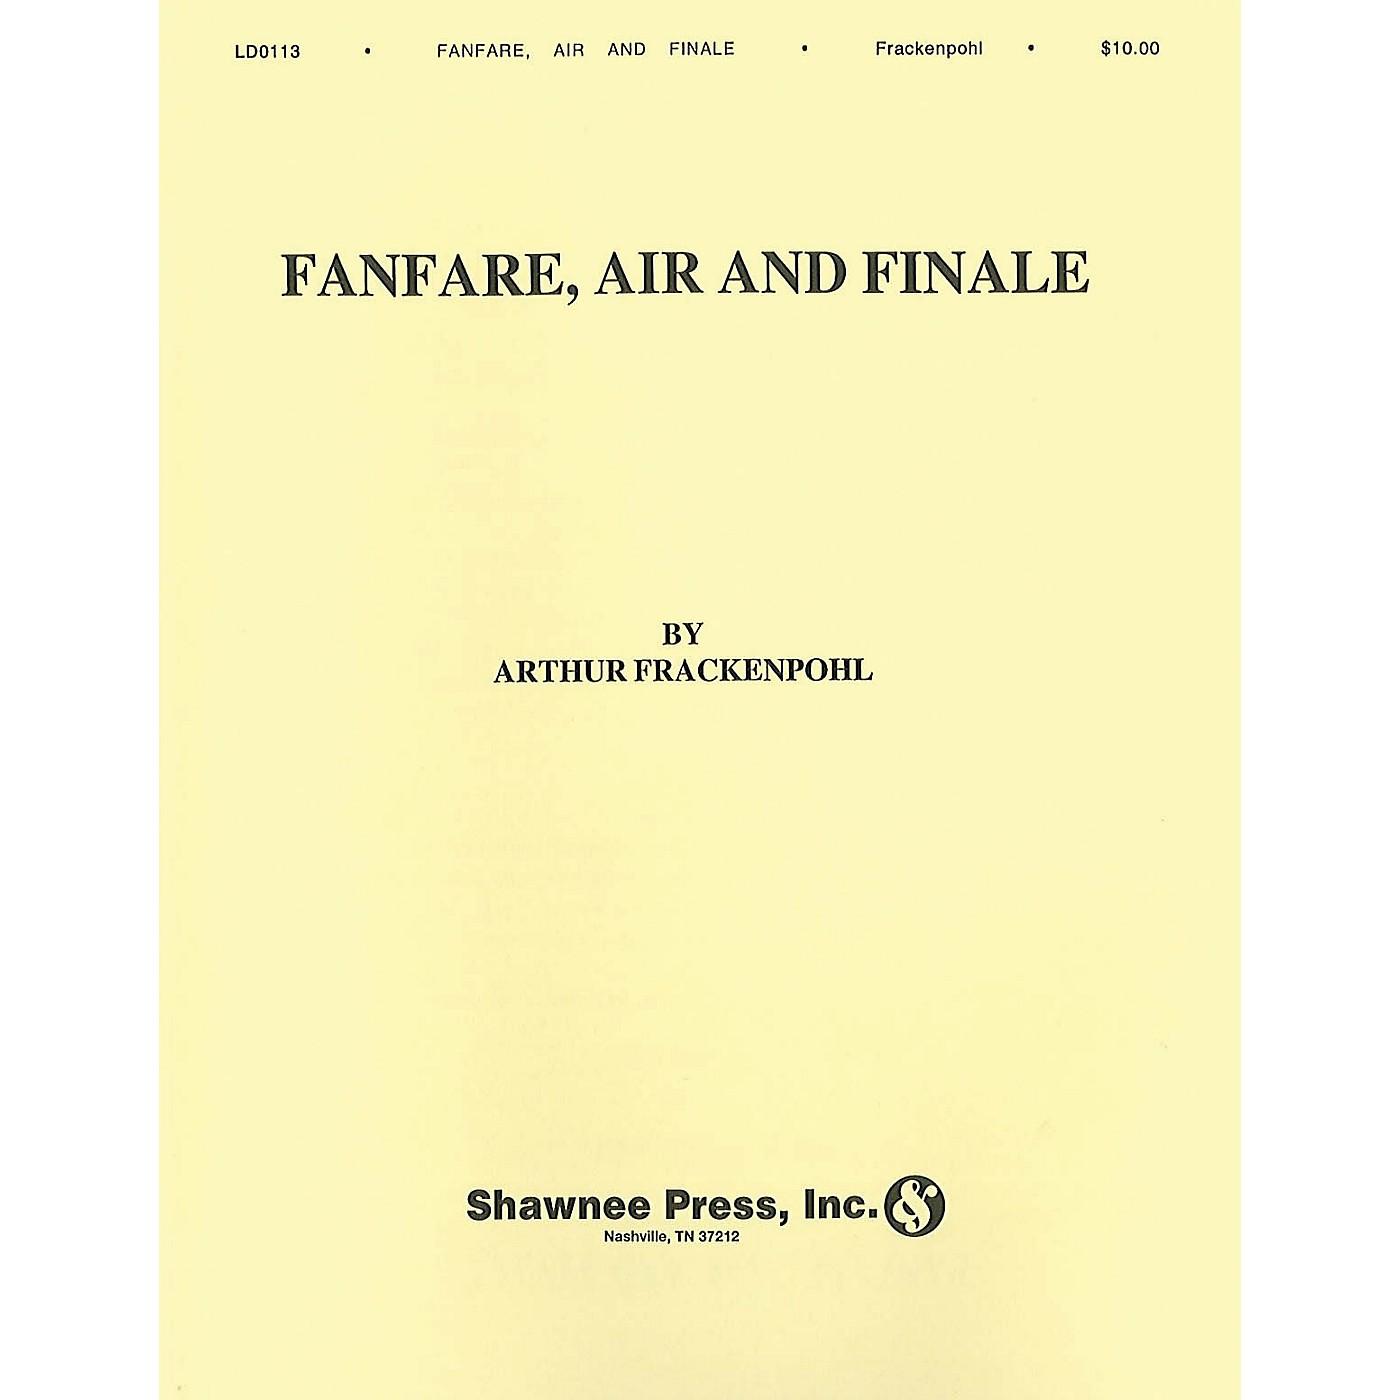 Hal Leonard Arthur Frackenpohl: Fanfare, Air And Finale Saxophone thumbnail